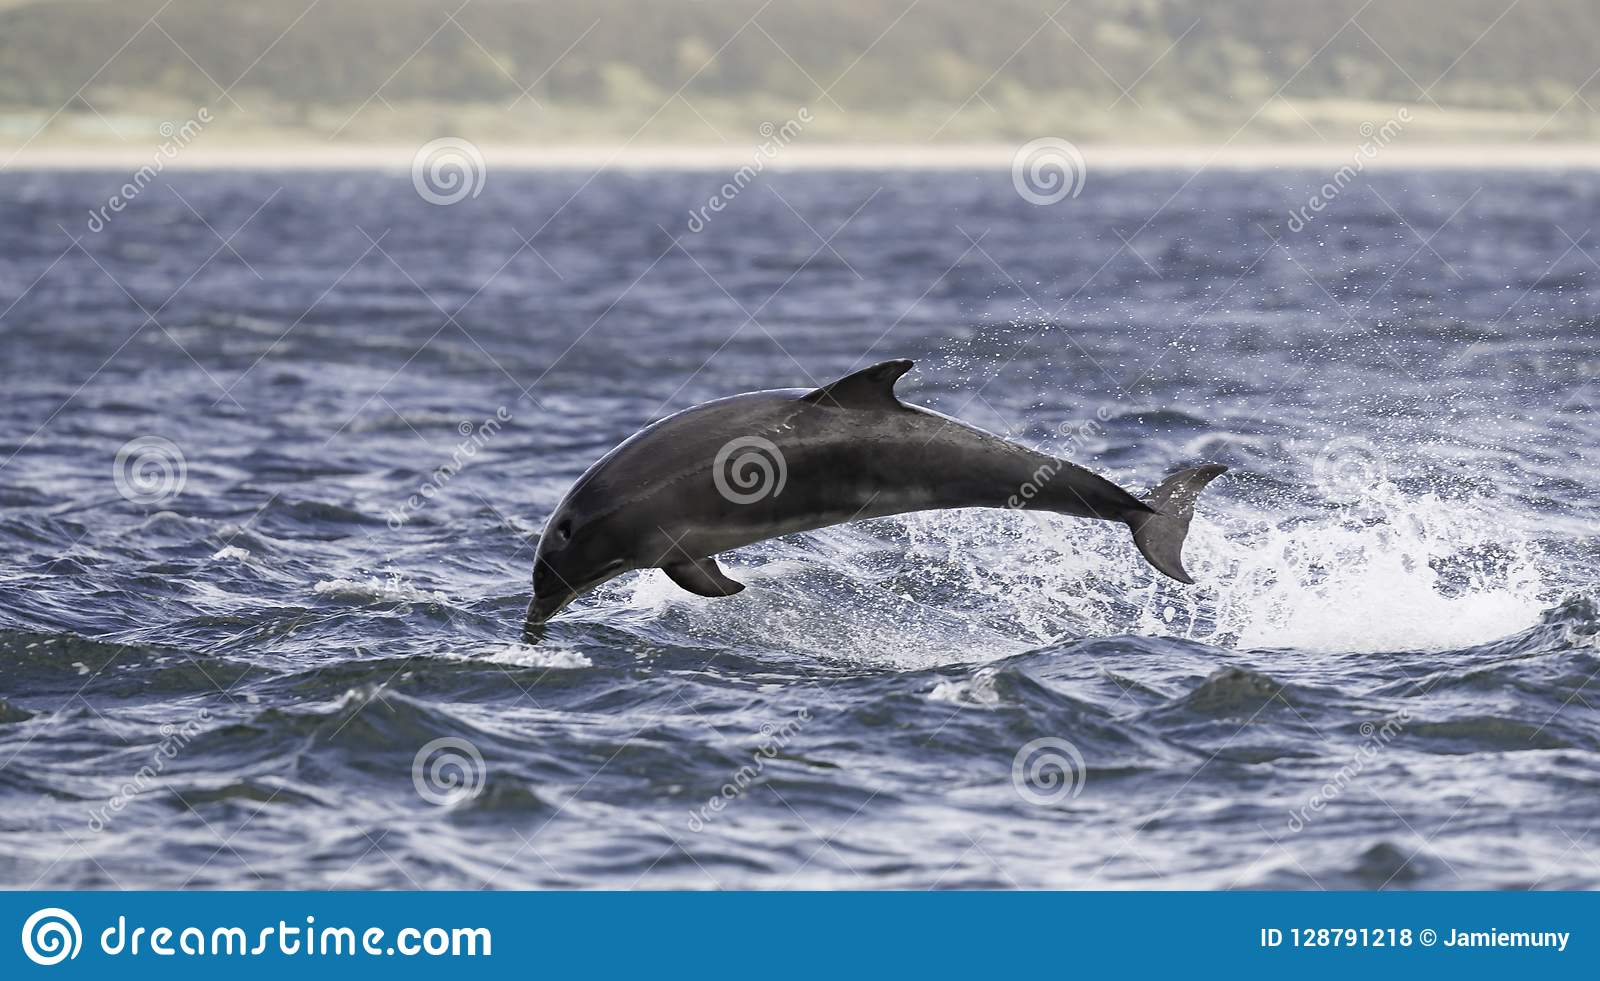 Jumping breaching Wild bottlenose dolphin tursiops truncatus.